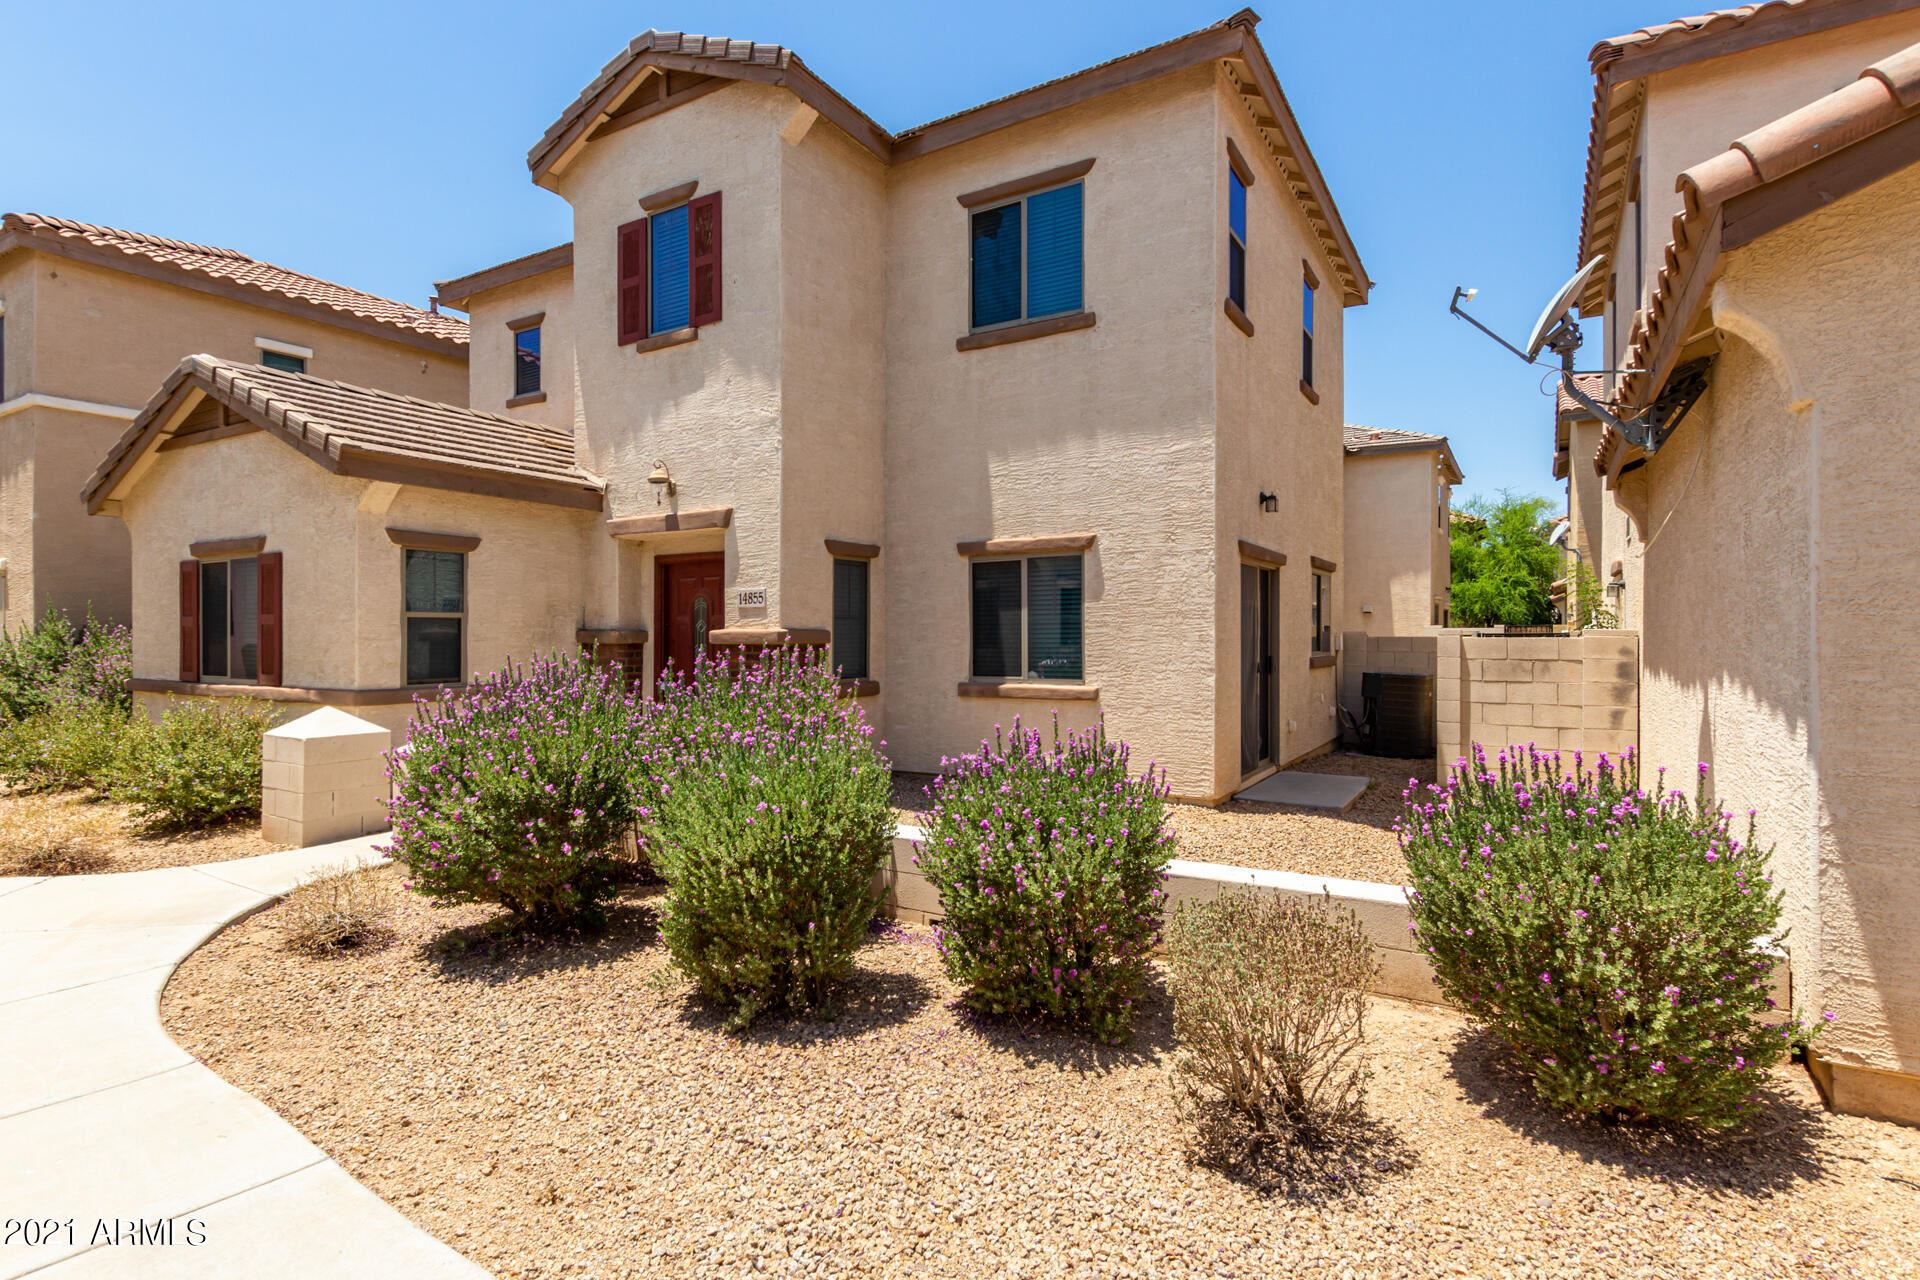 Photo of 14855 W ASHLAND Avenue, Goodyear, AZ 85395 (MLS # 6232136)